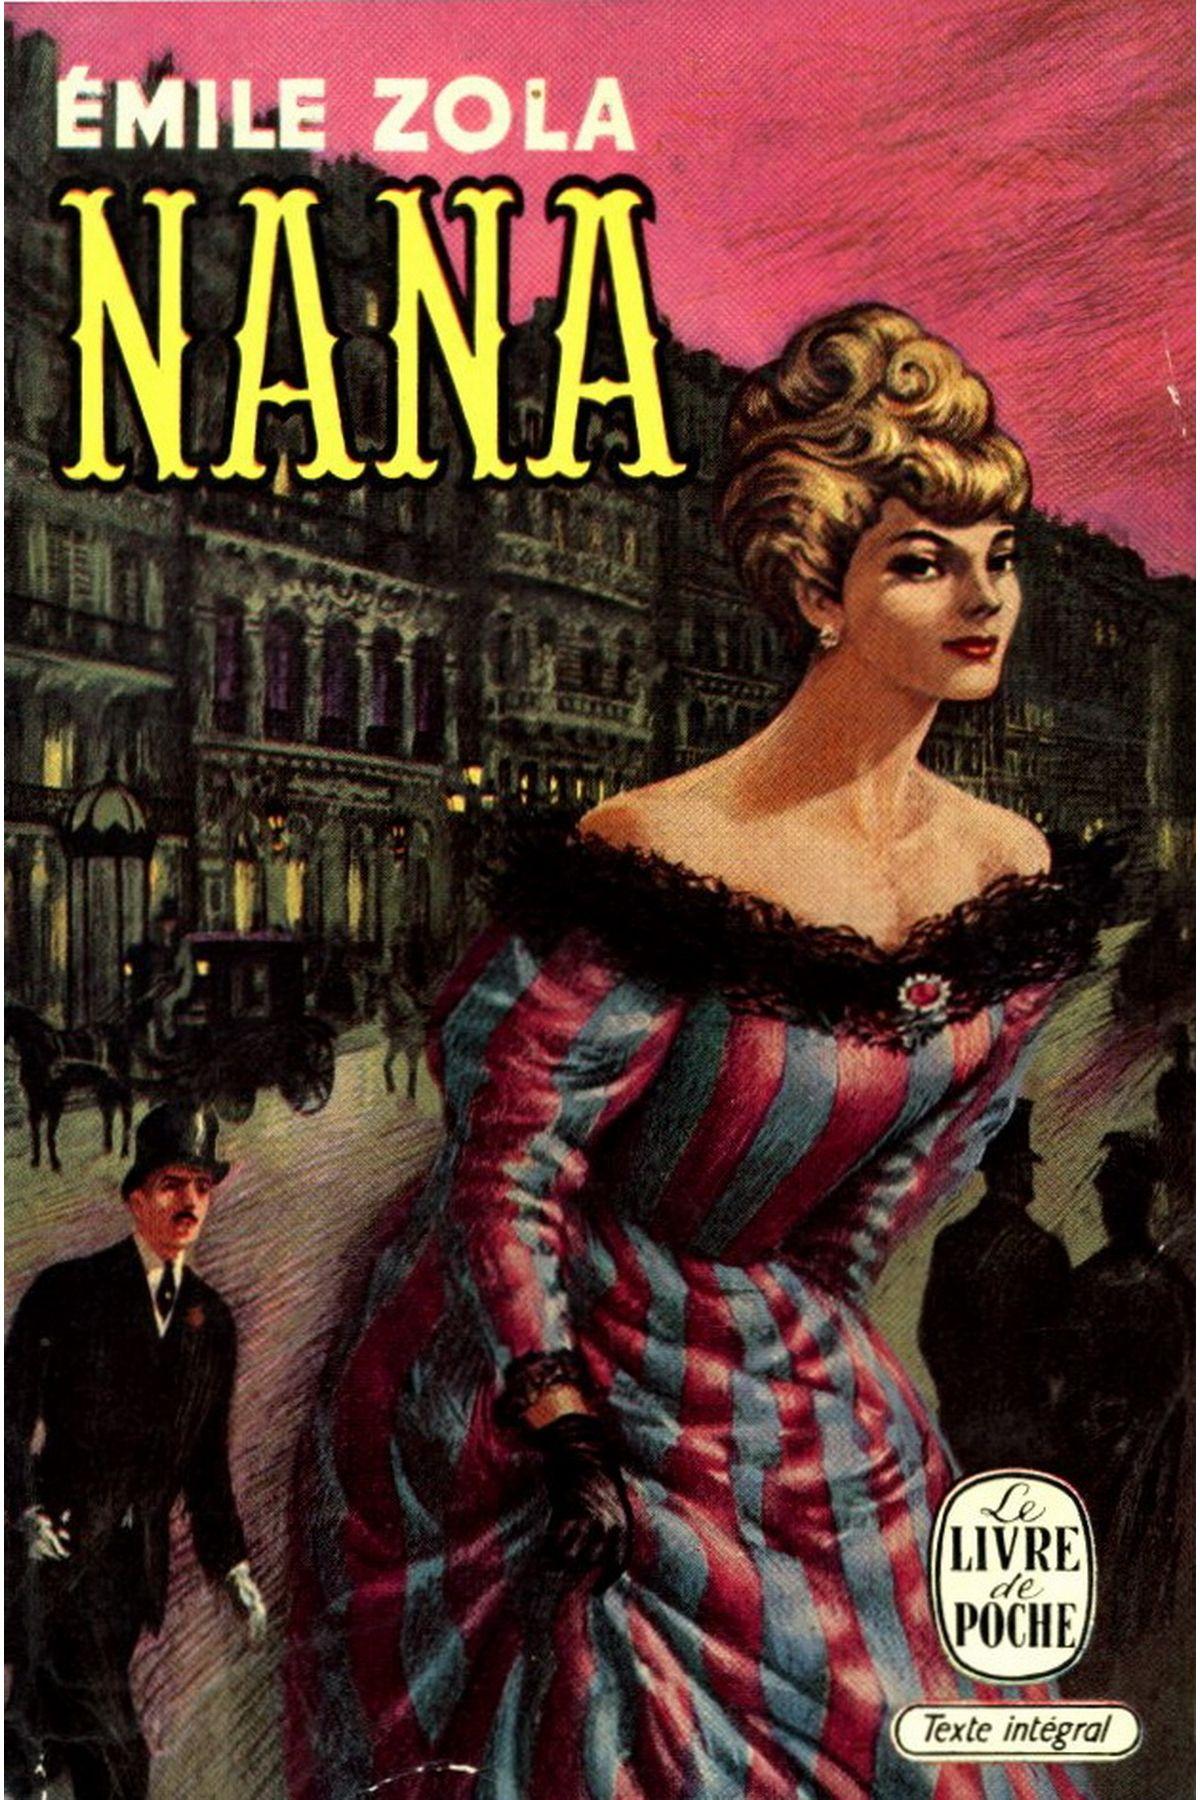 Nana Emile Zola Le Livre De Poche 1961